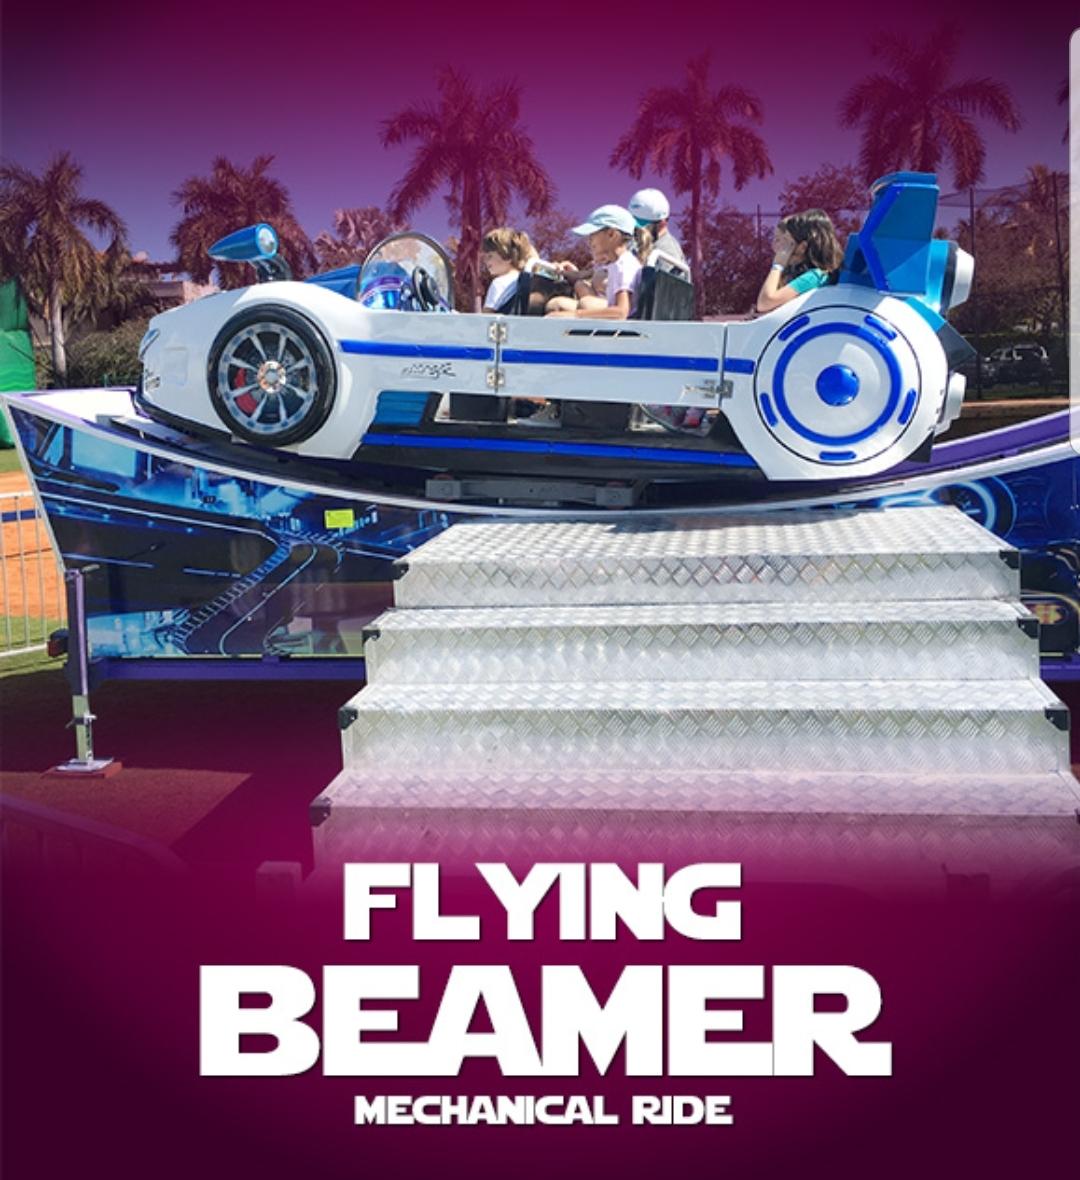 Mechanical Ride Flying Car